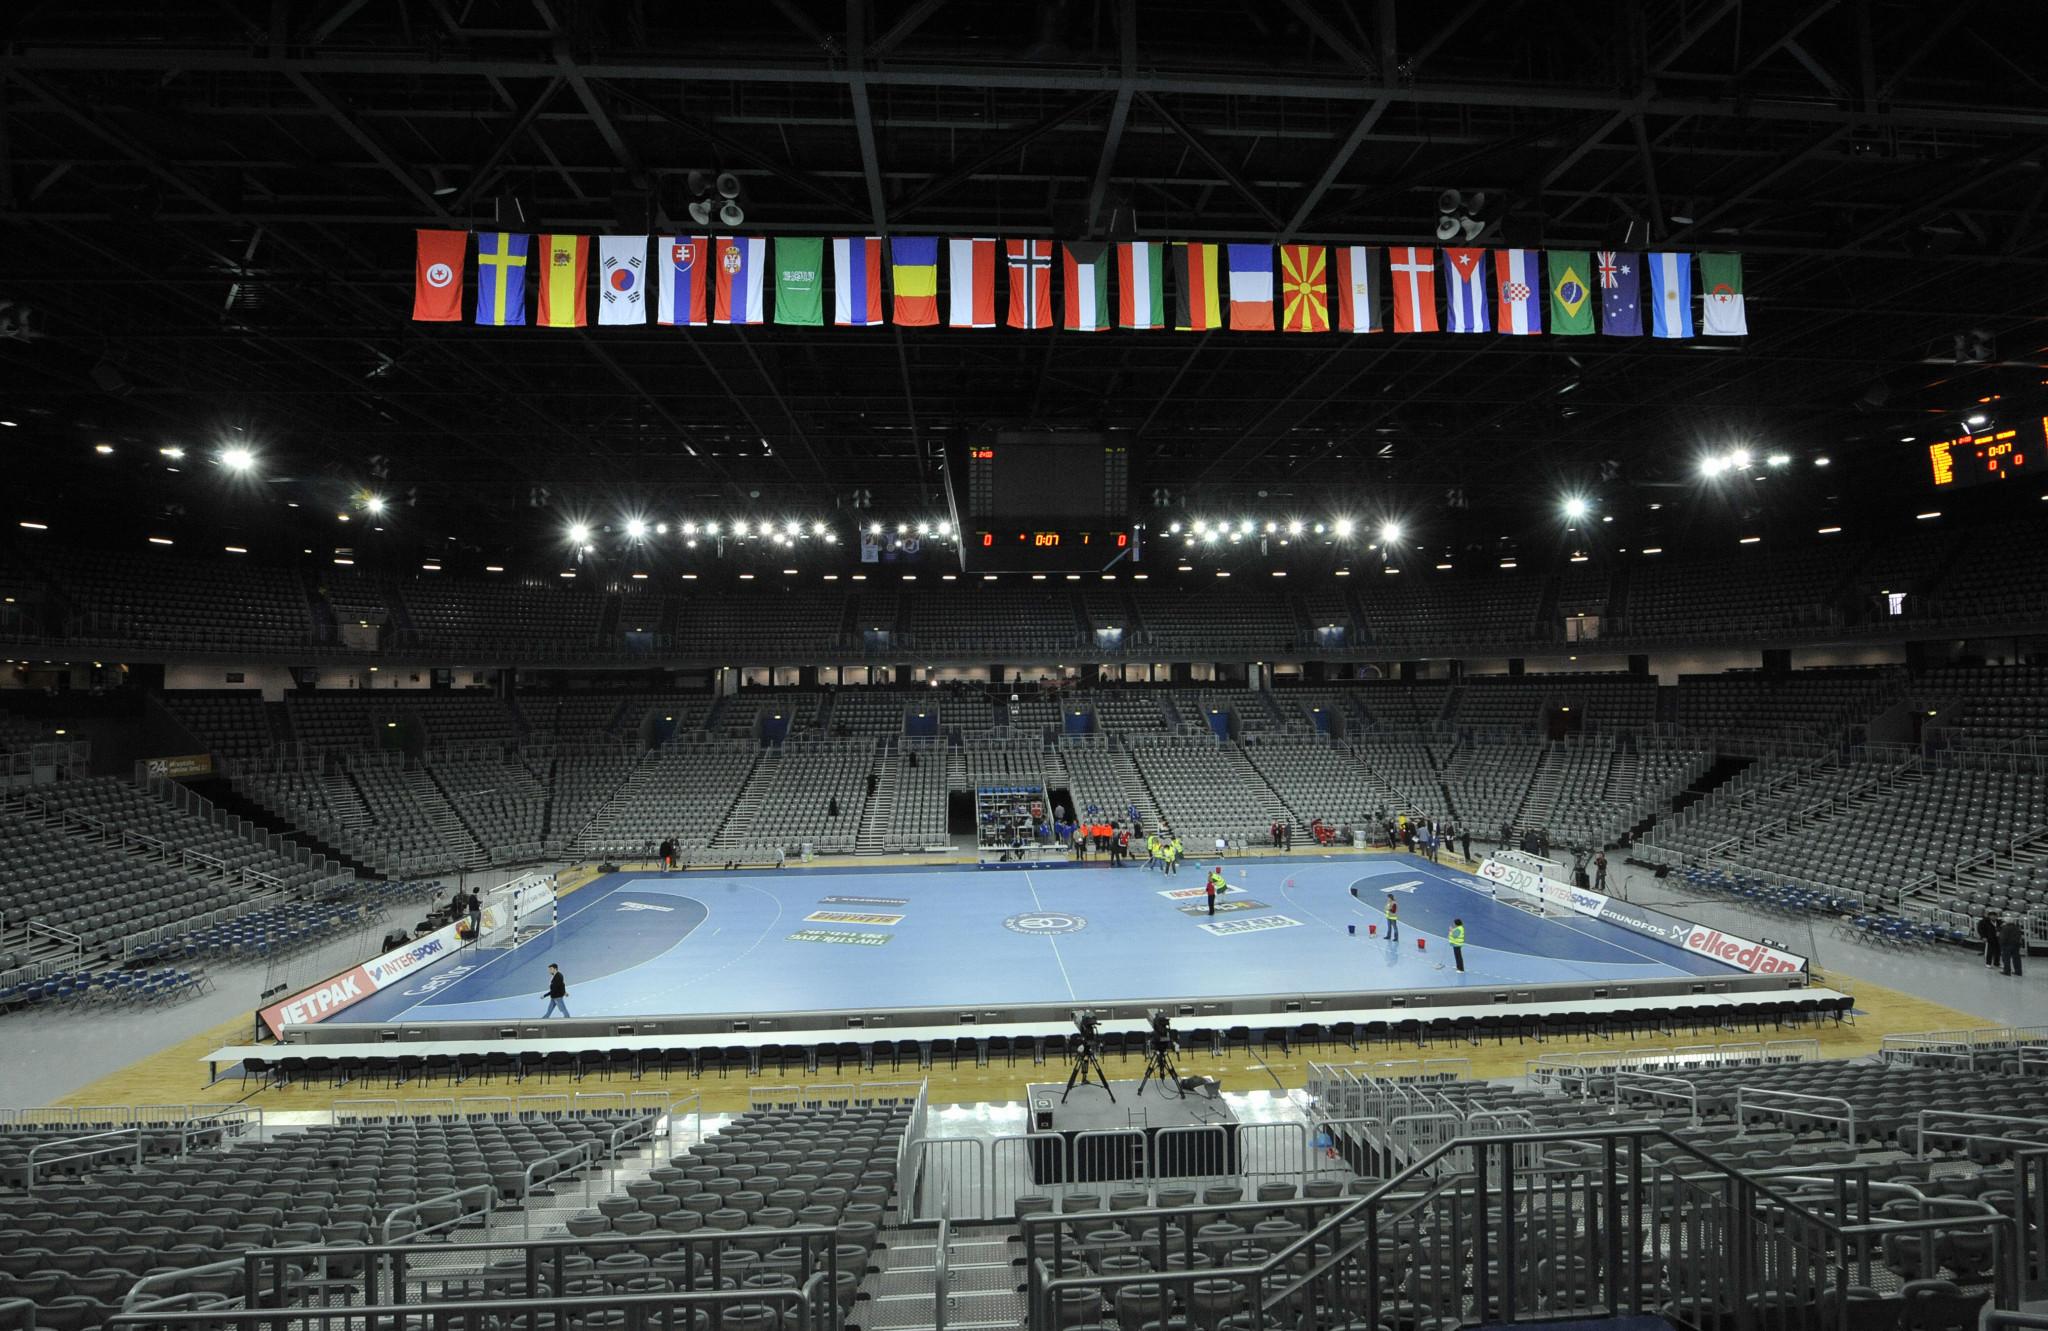 Zagreb European Figure Skating Championships venue turned into overflow COVID-19 hospital